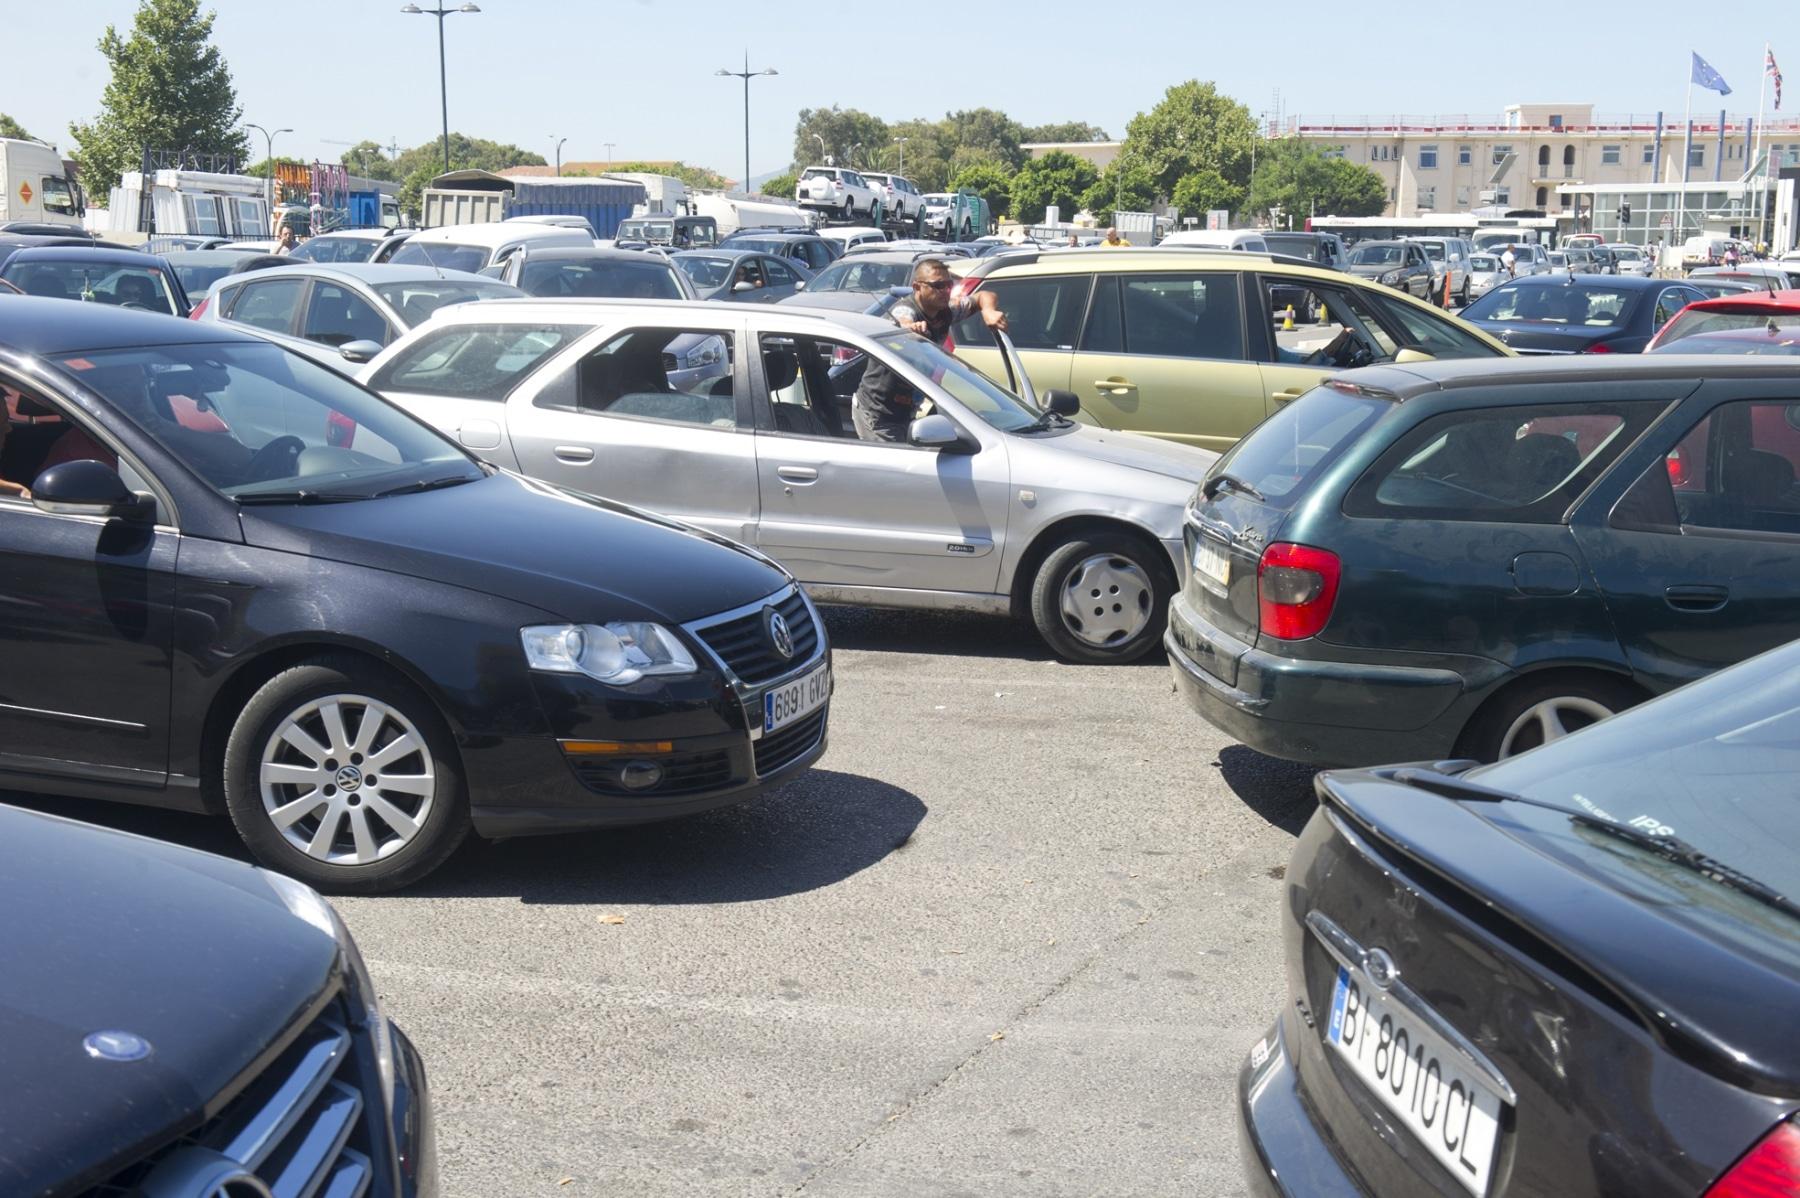 21-agosto-2014-colas-de-entrada-y-salida-de-gibraltar29_14989354572_o